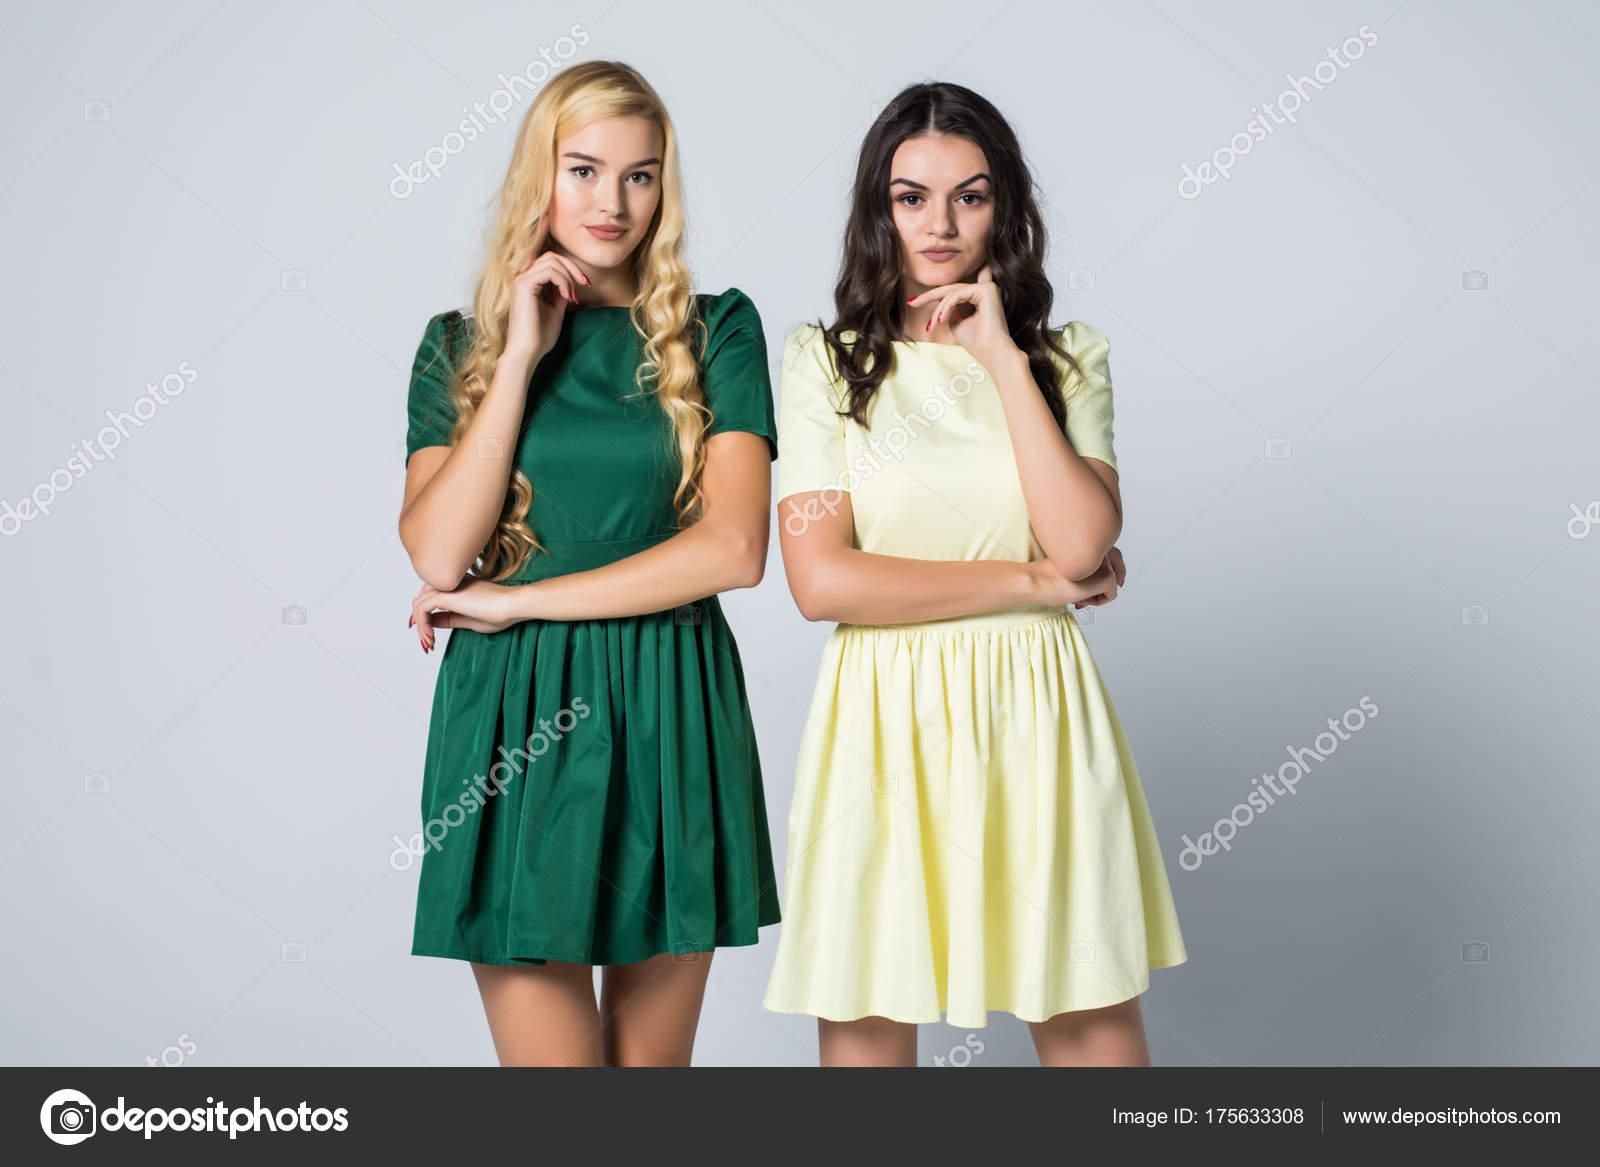 ac2e03a71bbe Πορτρέτο του δύο ελκυστική ξανθιά και μελαχρινή νεαρές γυναίκες σε φορέματα  βλέπουν φωτογραφική μηχανή να ποζάρει